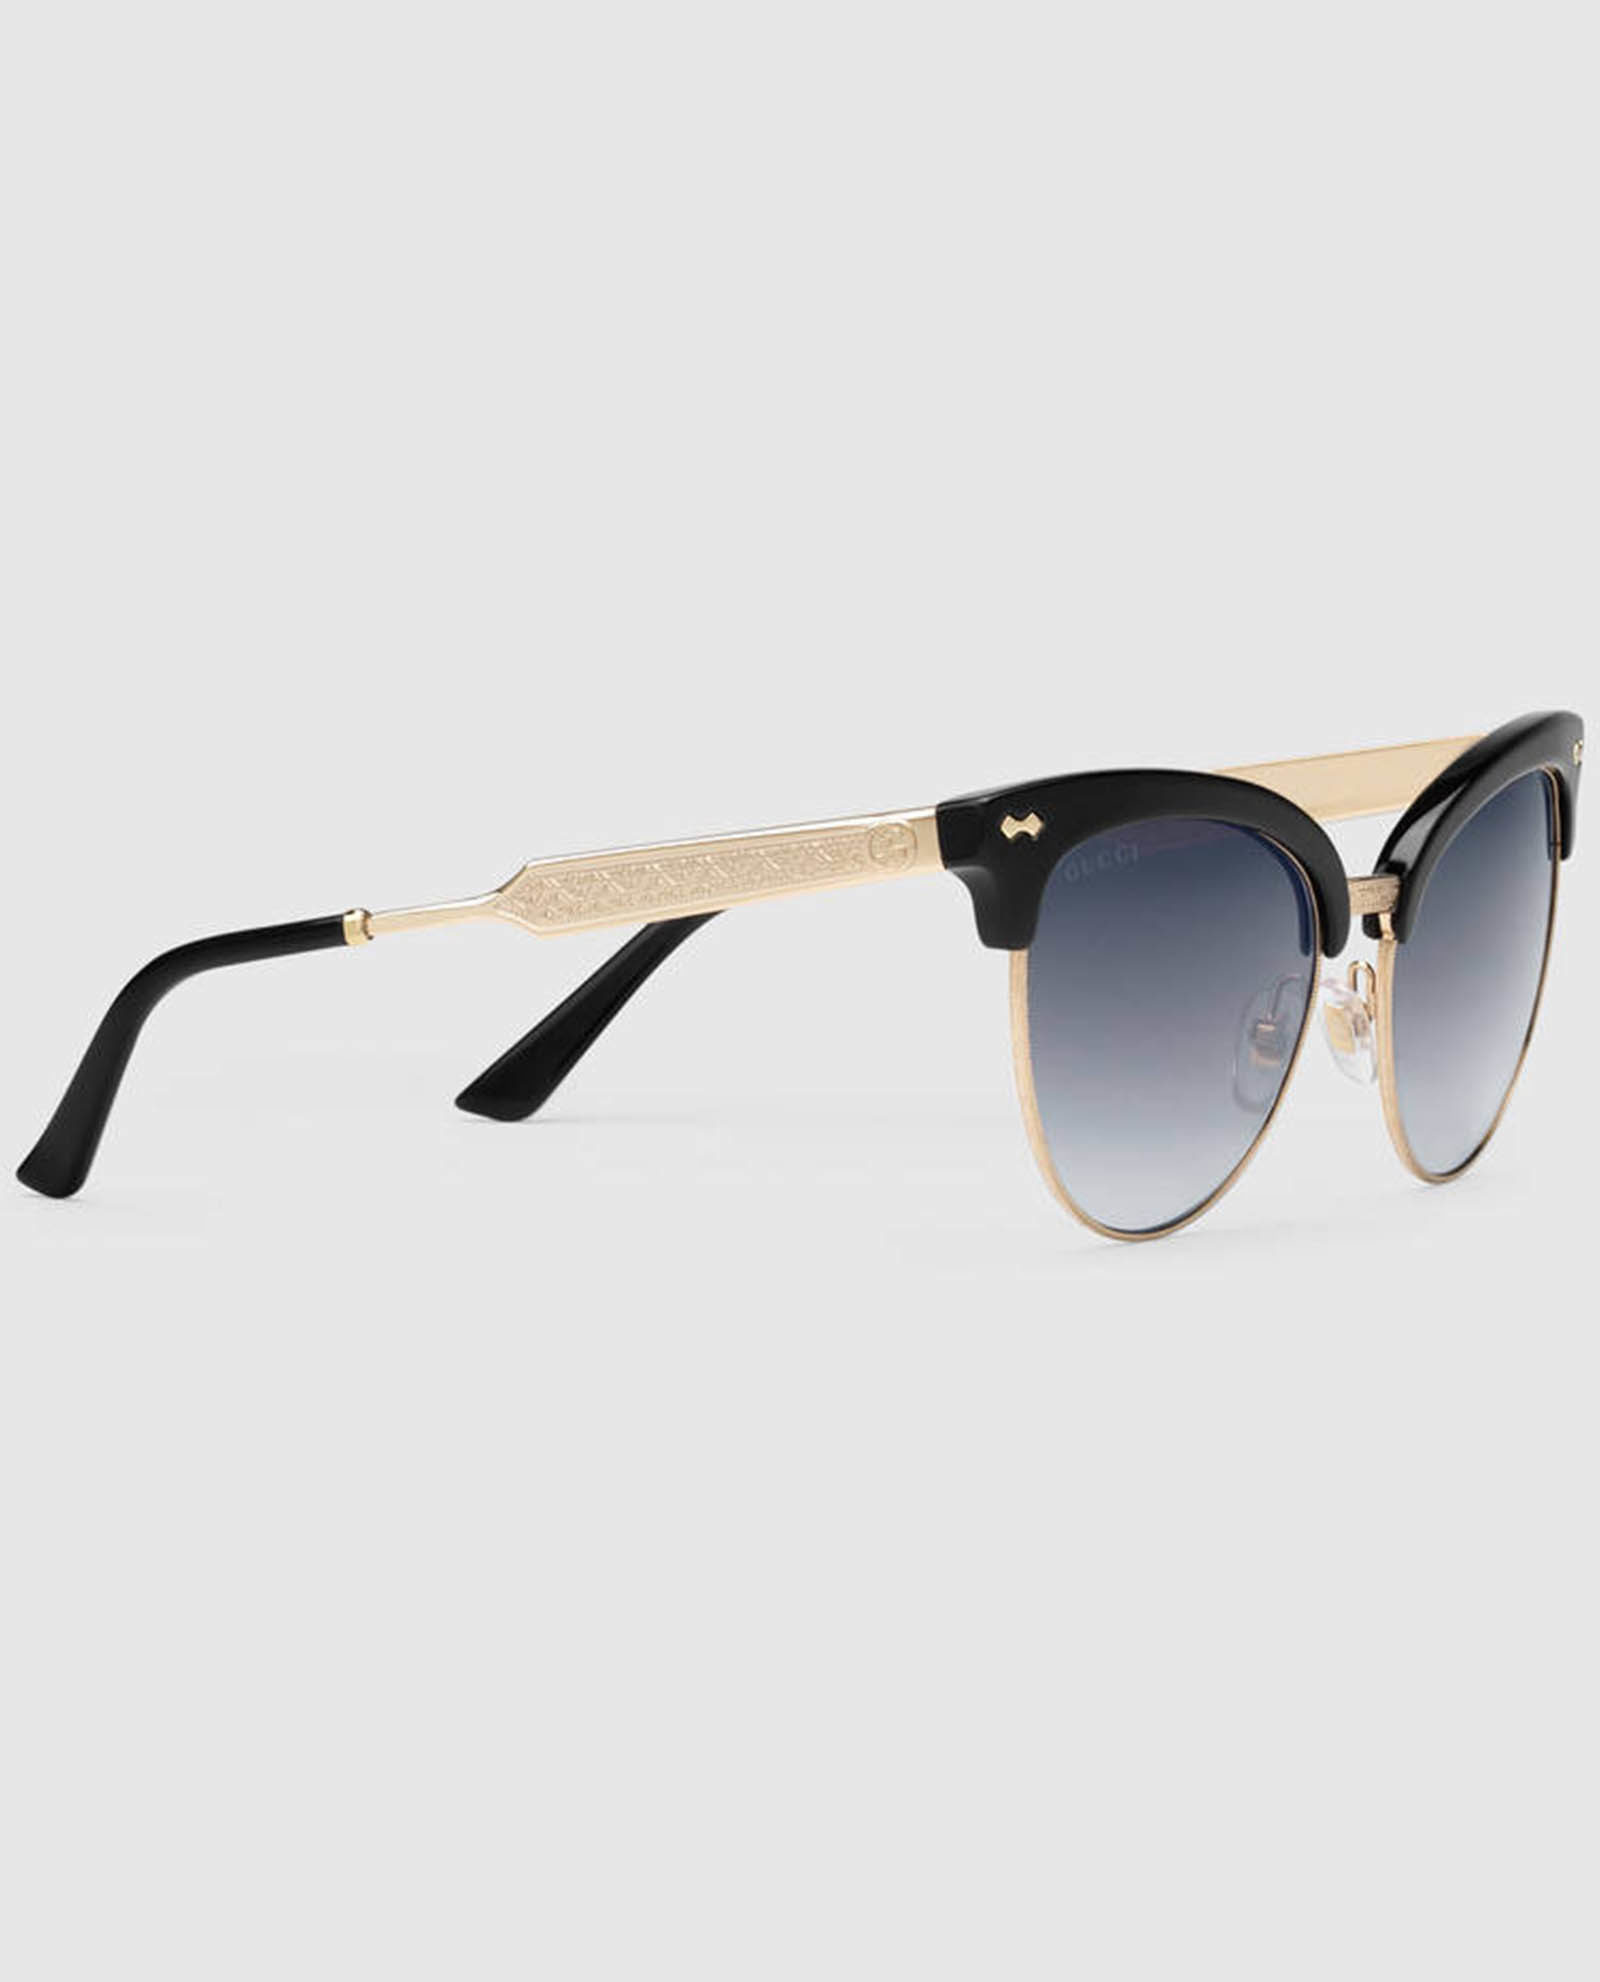 https://www.polydoruoptika.gr/wp-content/uploads/2018/03/434072_I3330_1890_002_100_0000_Light-Cat-eye-acetate-and-metal-sunglasses-GUCCI-WOMAN.jpg